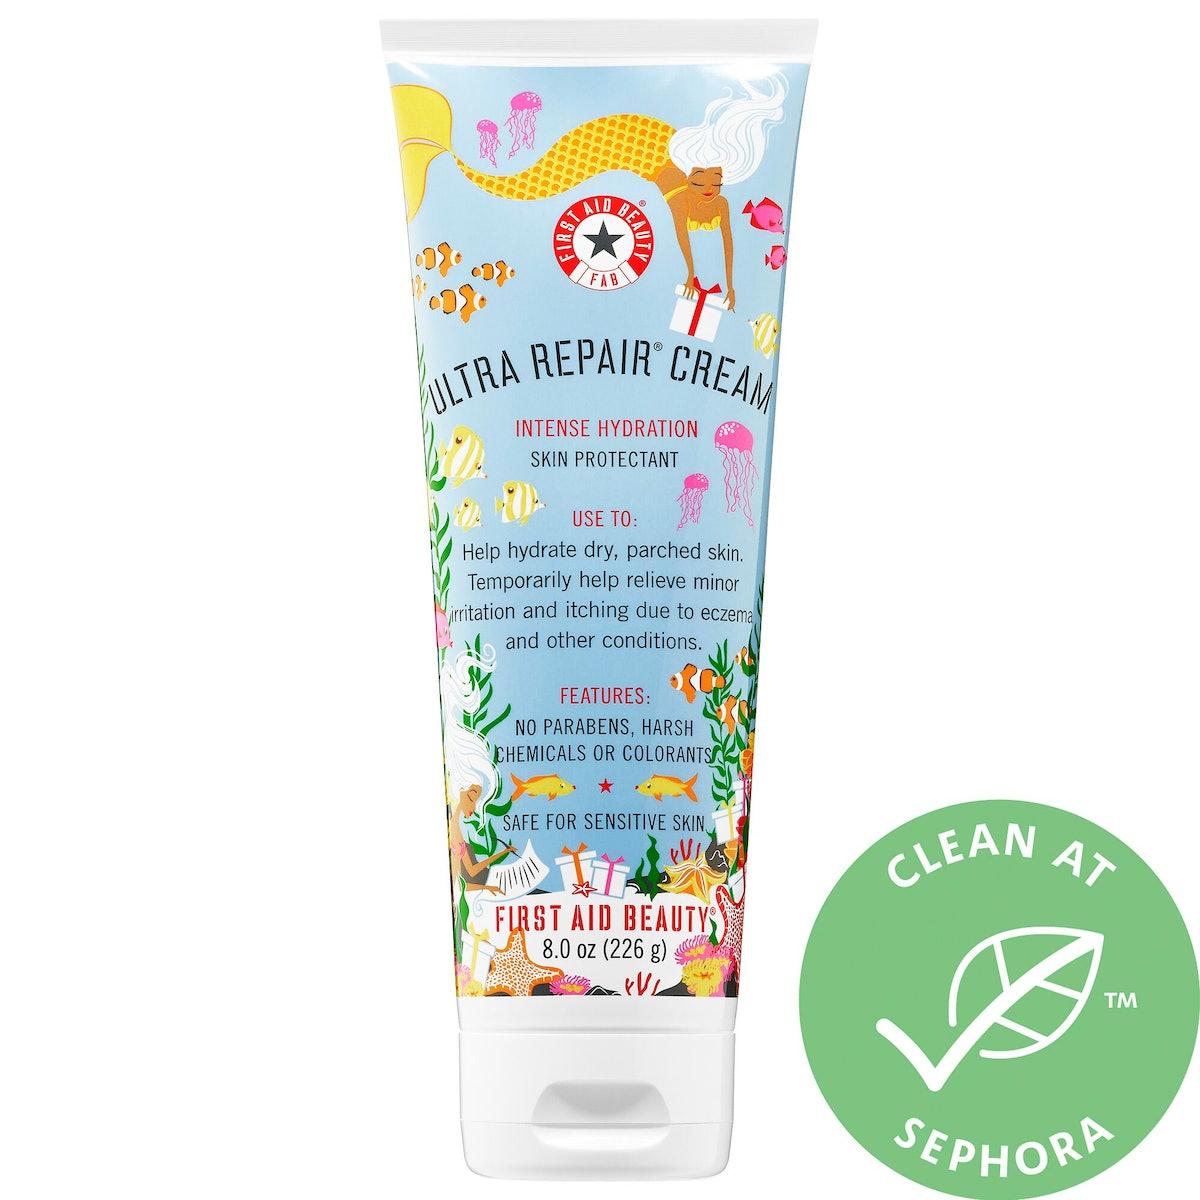 Limited Edition Ultra Repair Cream Intense Hydration